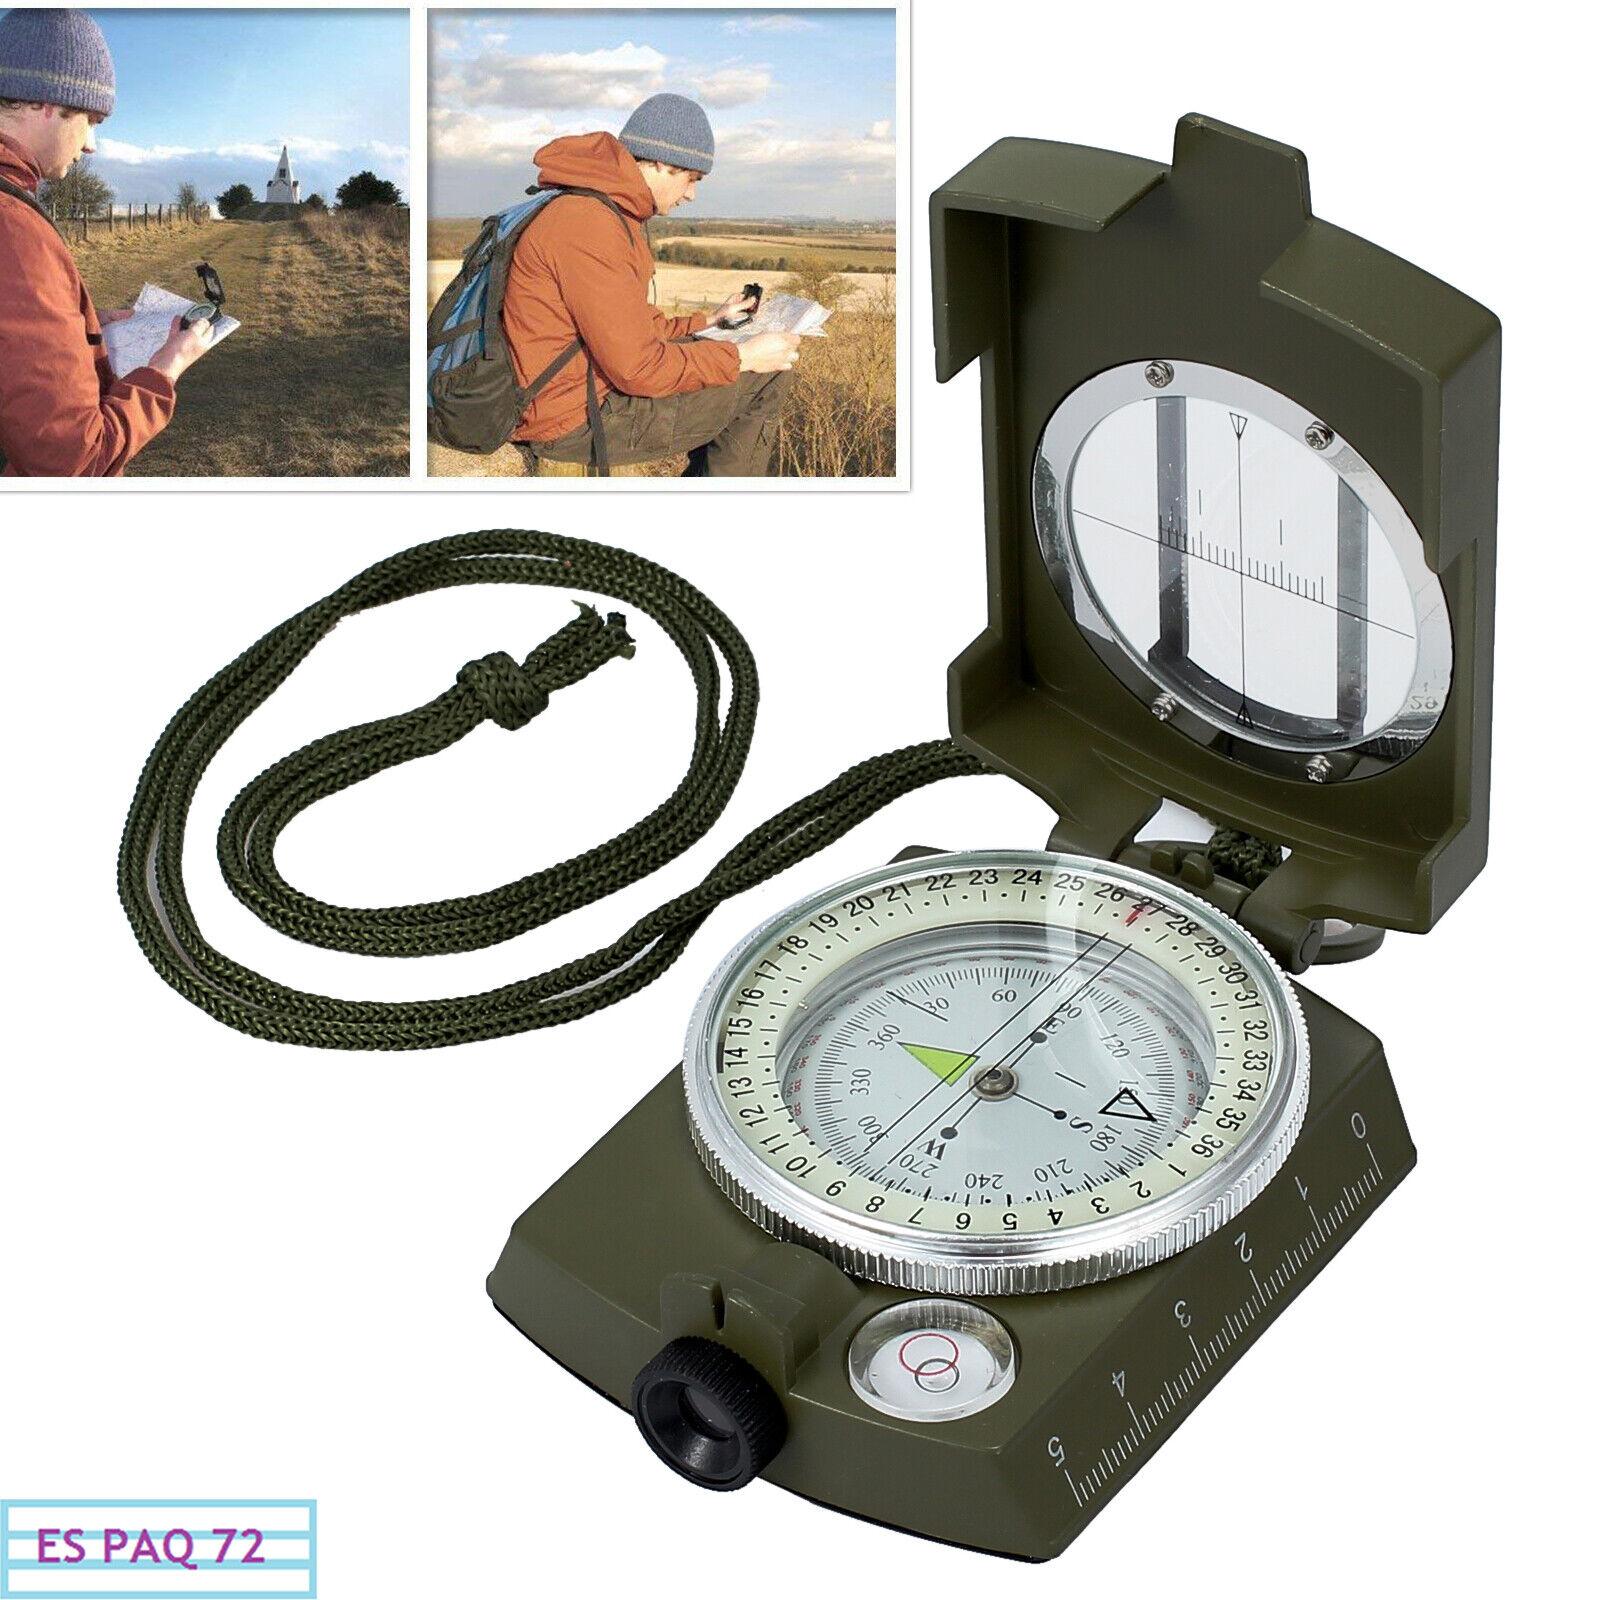 Brújula Militar Impermeable Proster Metal Para Apuntar Clinómetro + Bolsa Cordón